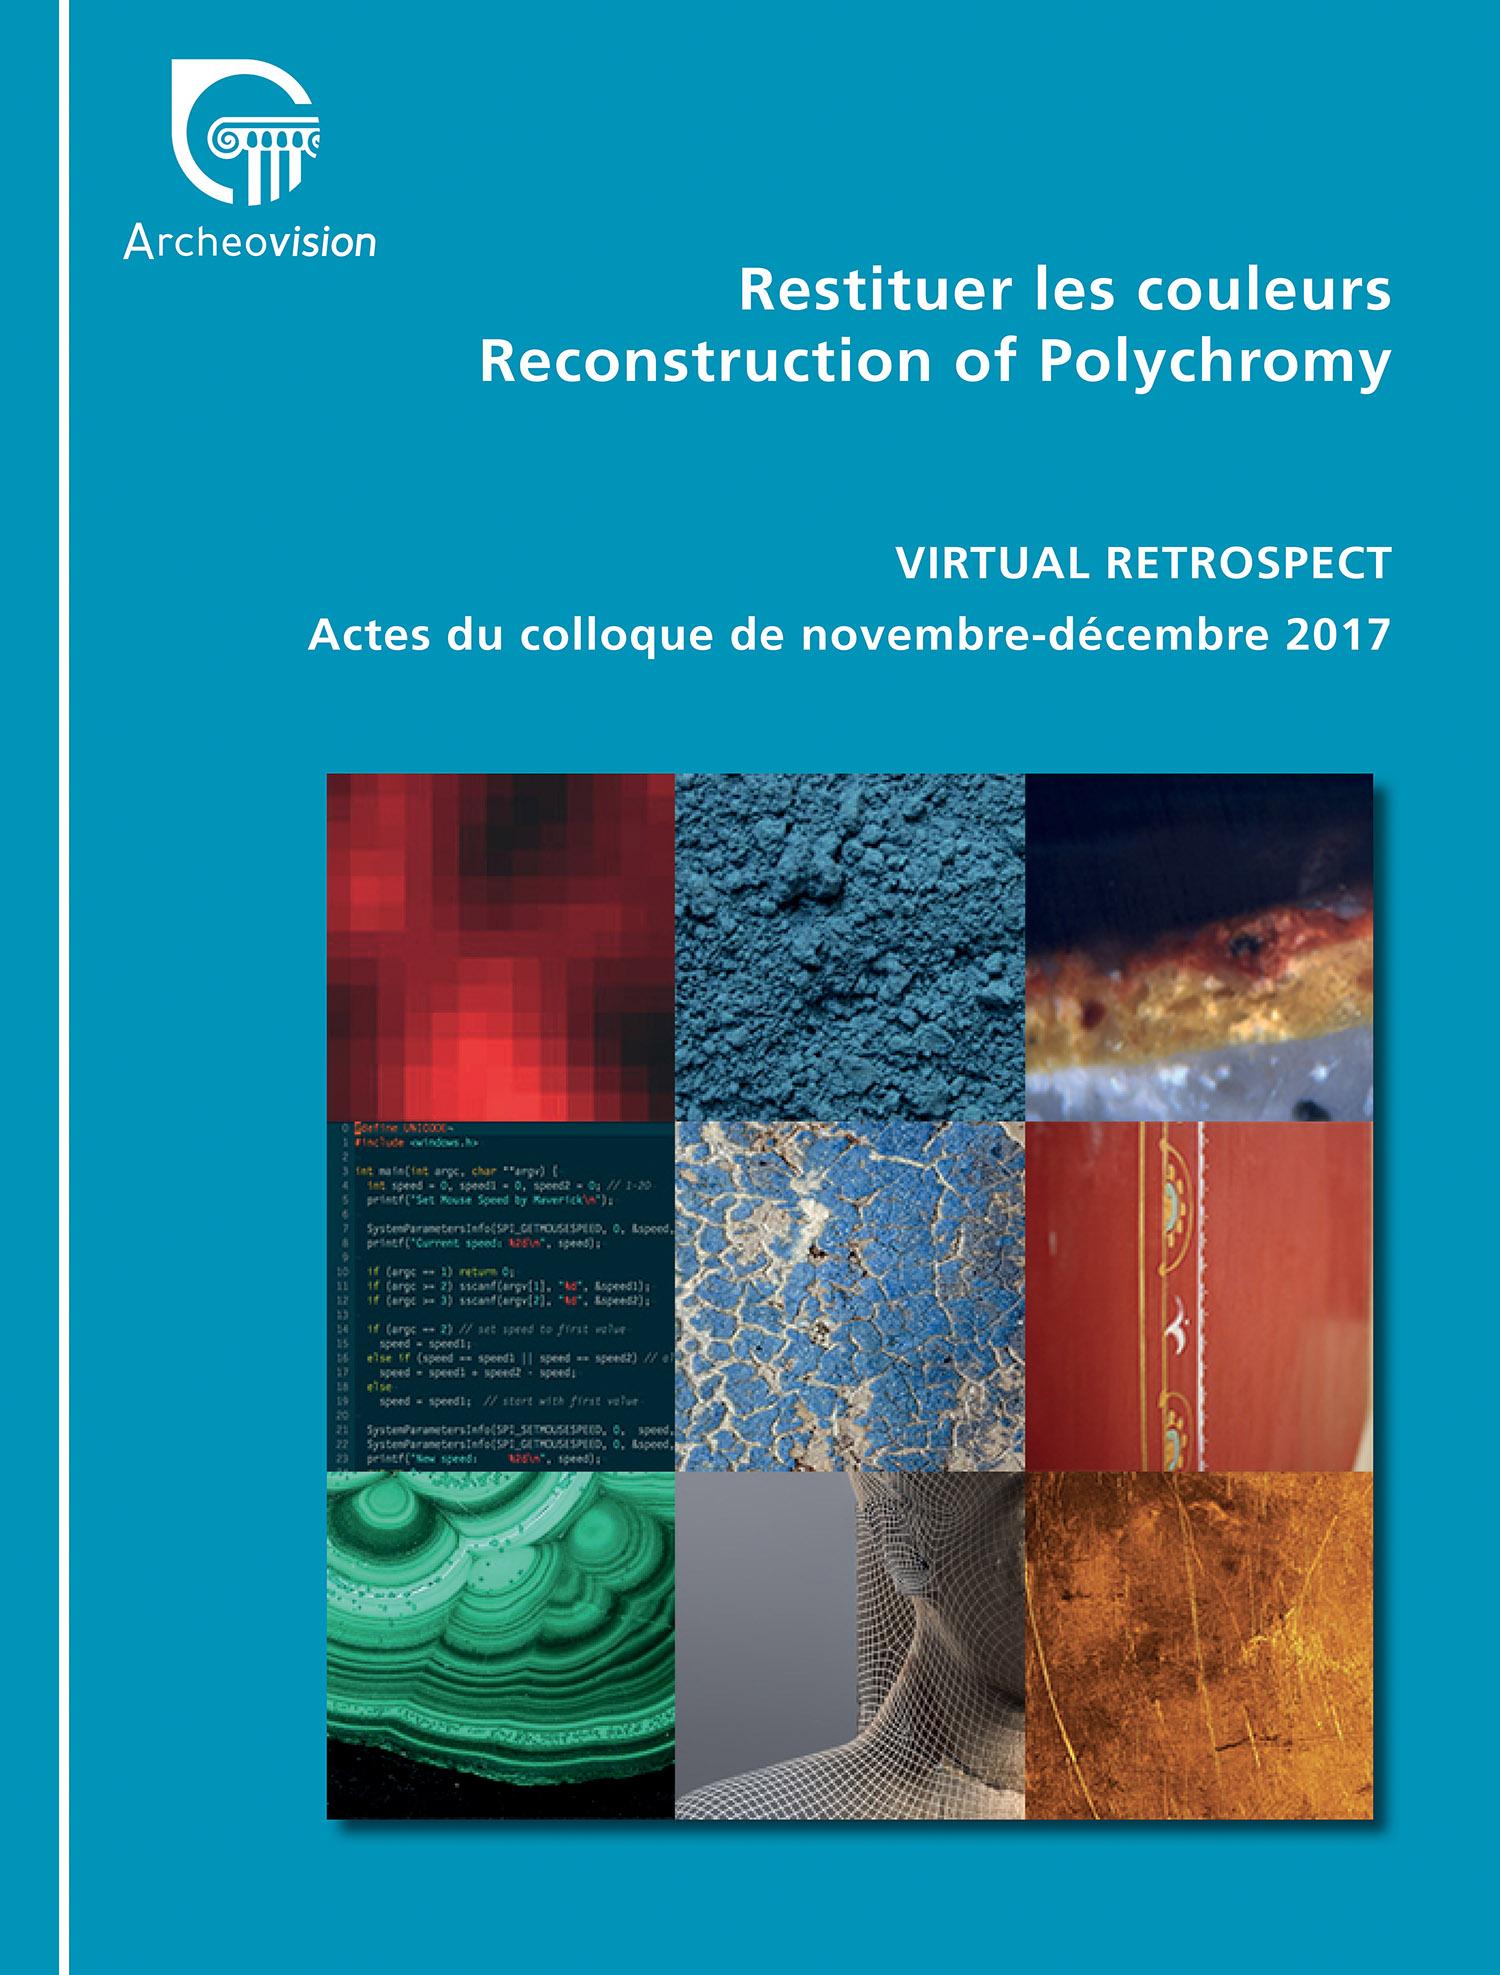 Virtual Retrospect 2017